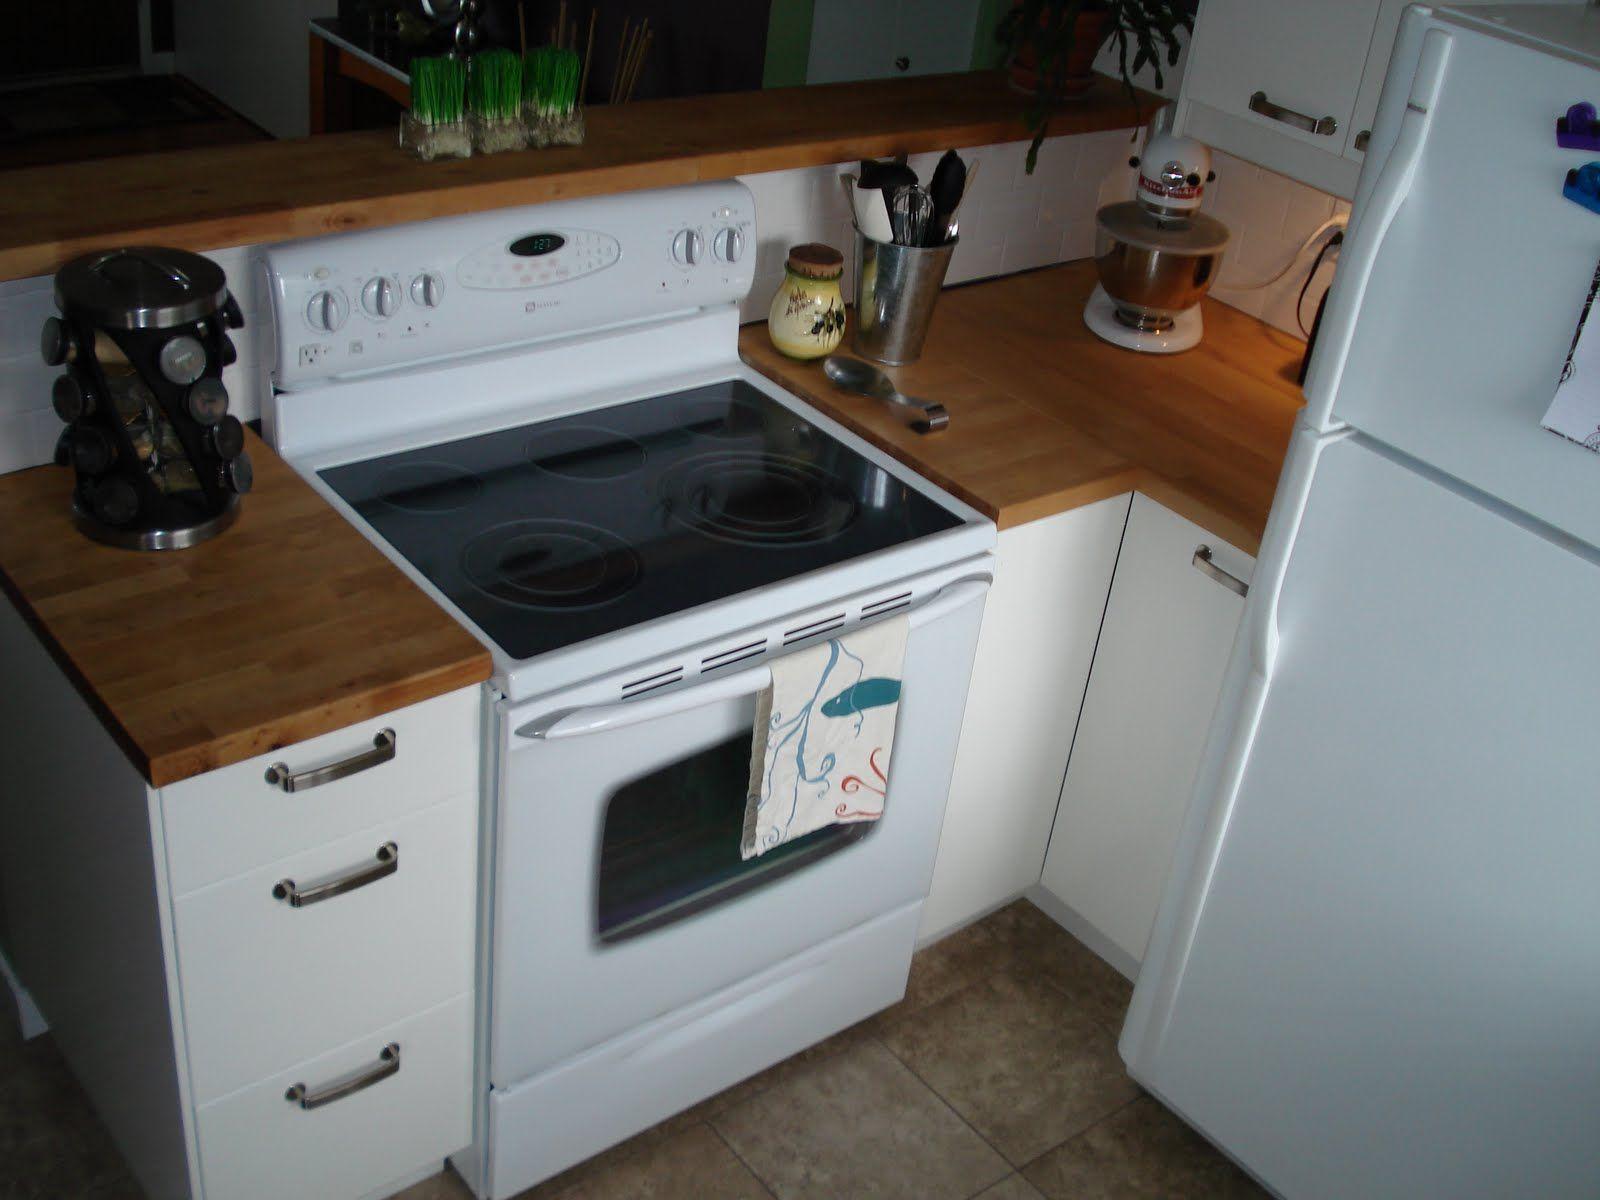 stove in peninsula with ledge | Kitchen | Pinterest | Stove ...